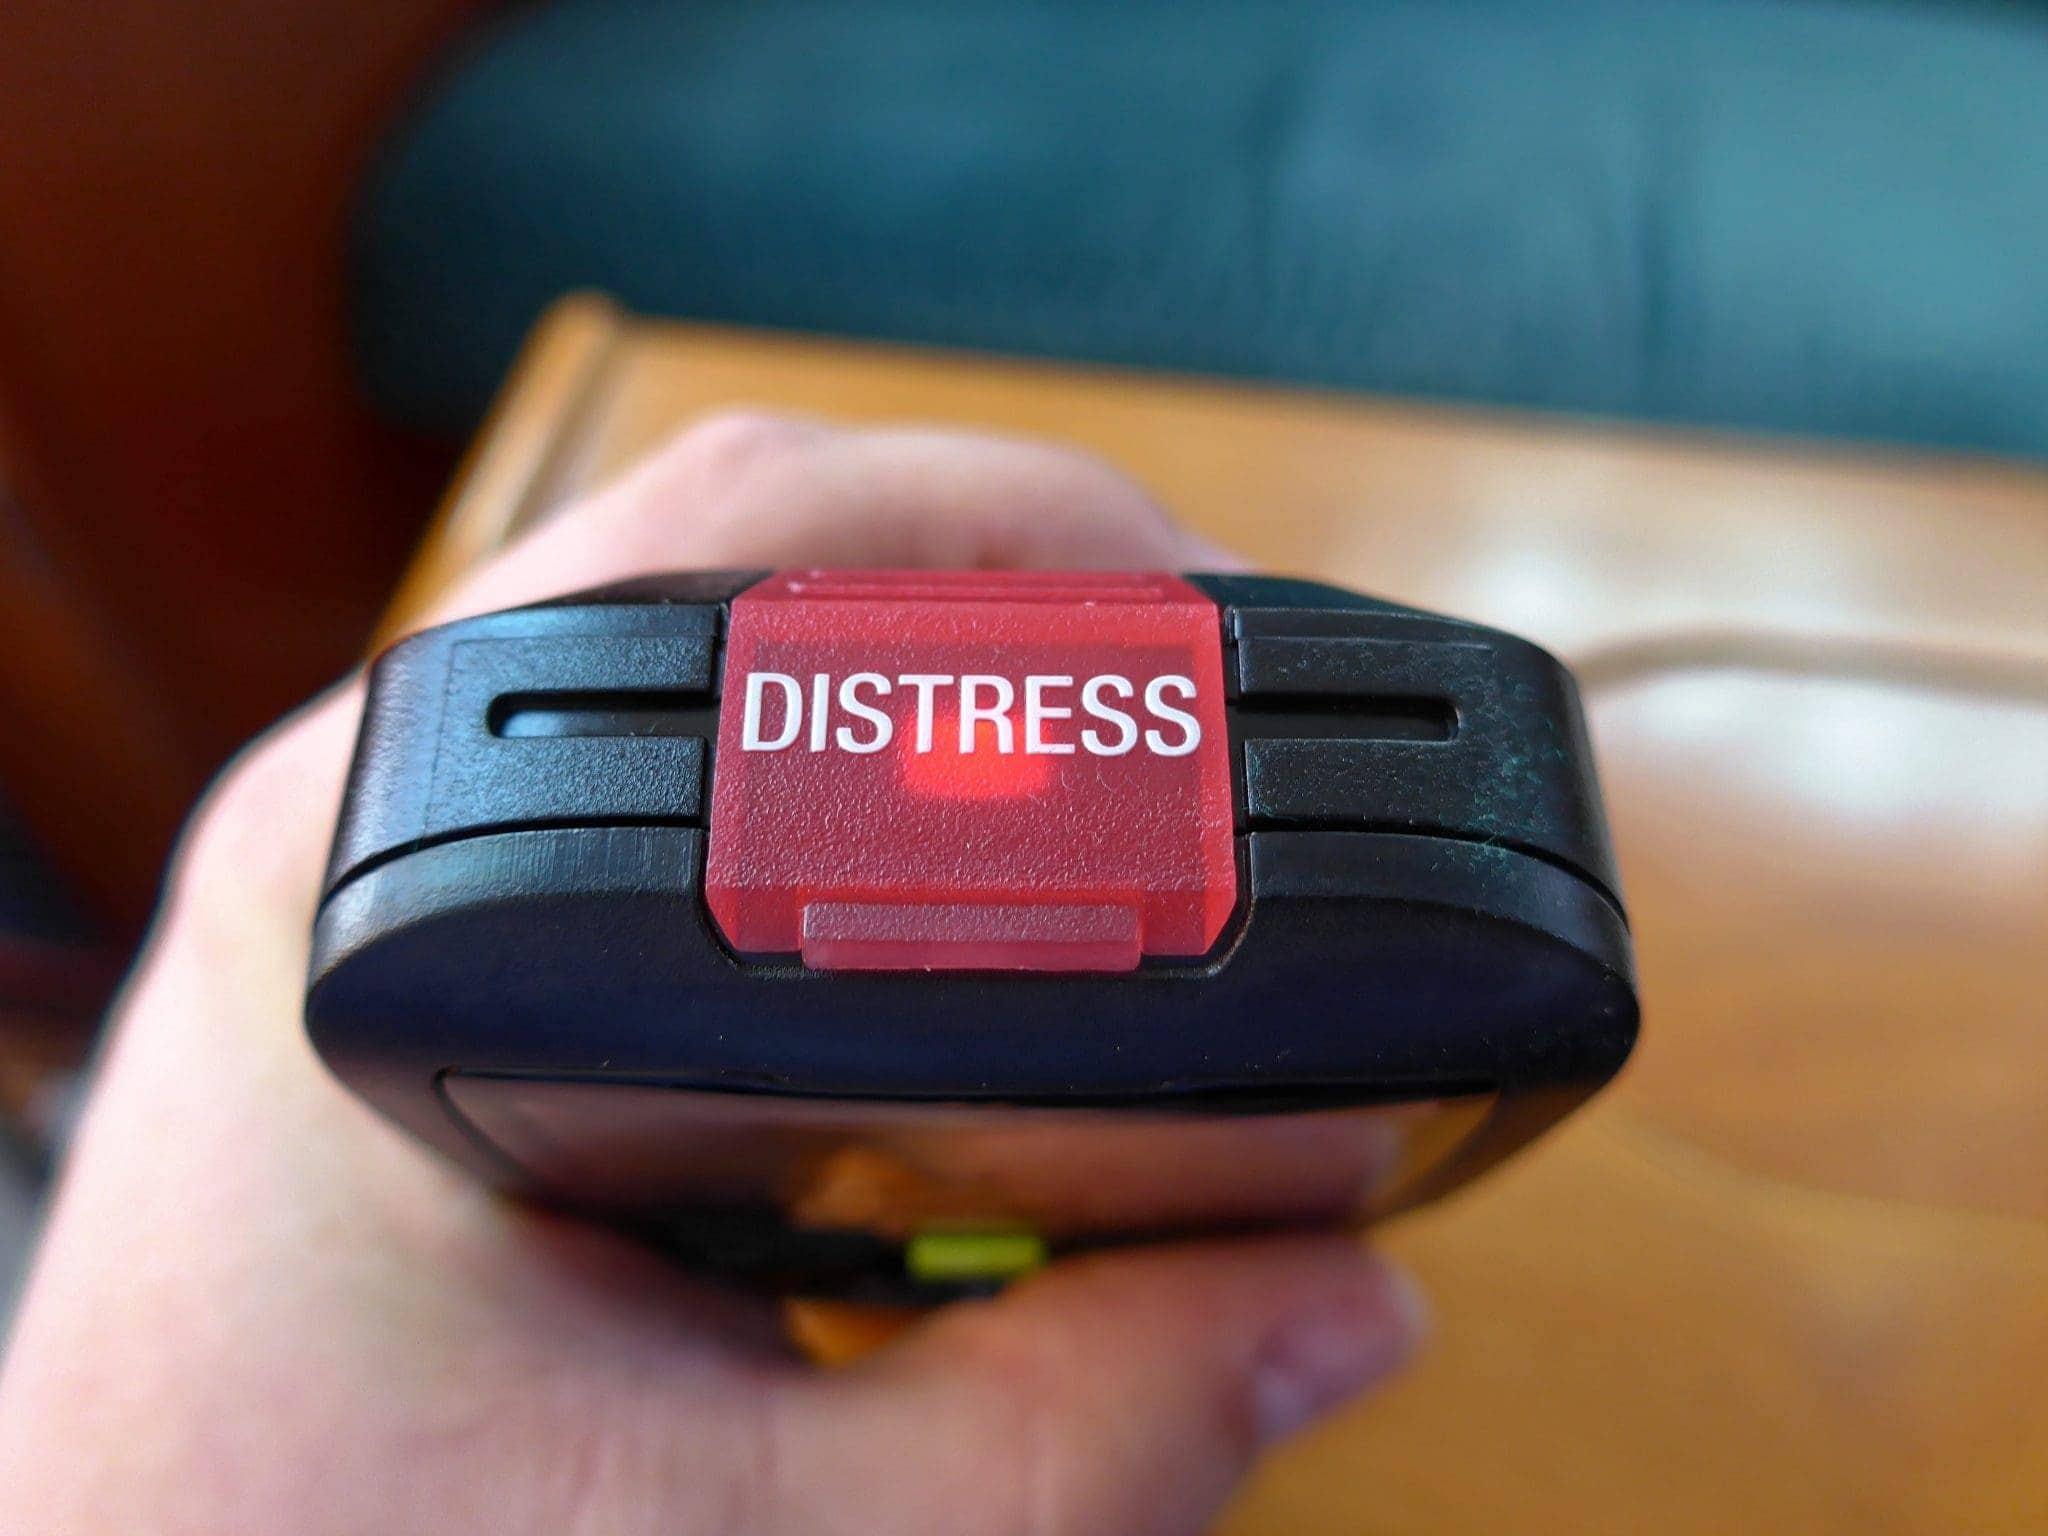 Top showing lit distress button